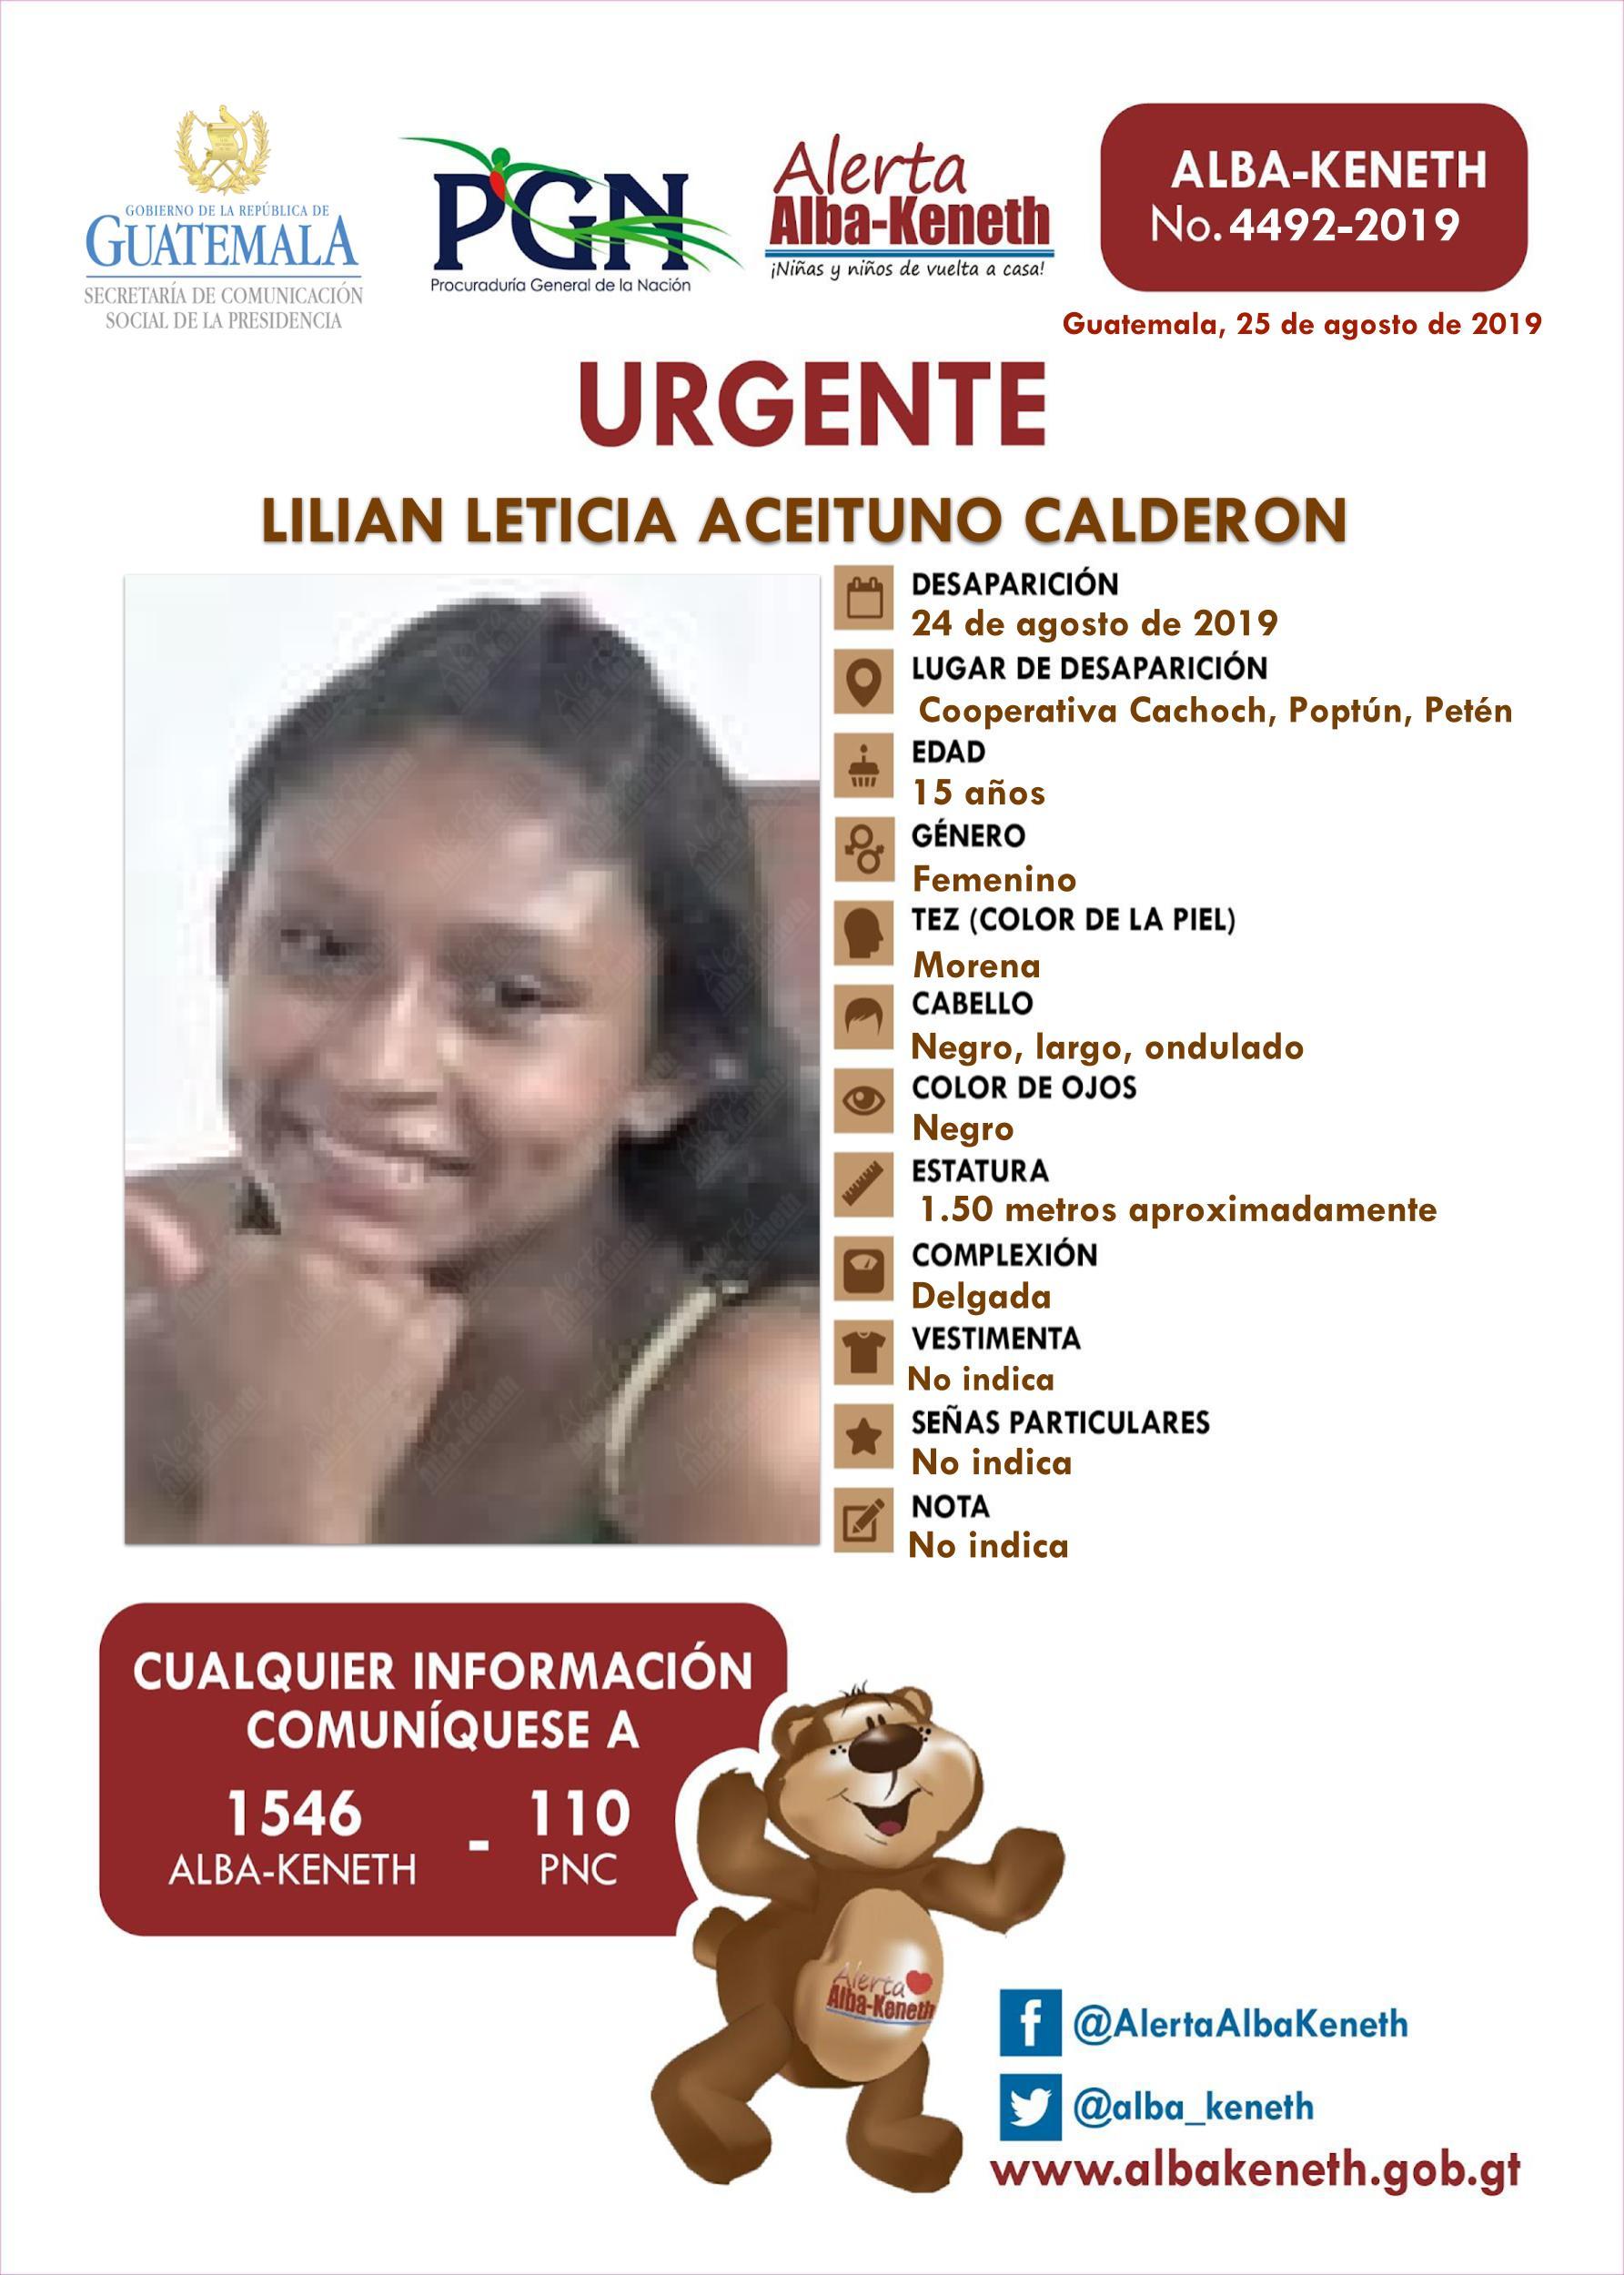 Lilian Leticia Aceituno Calderon